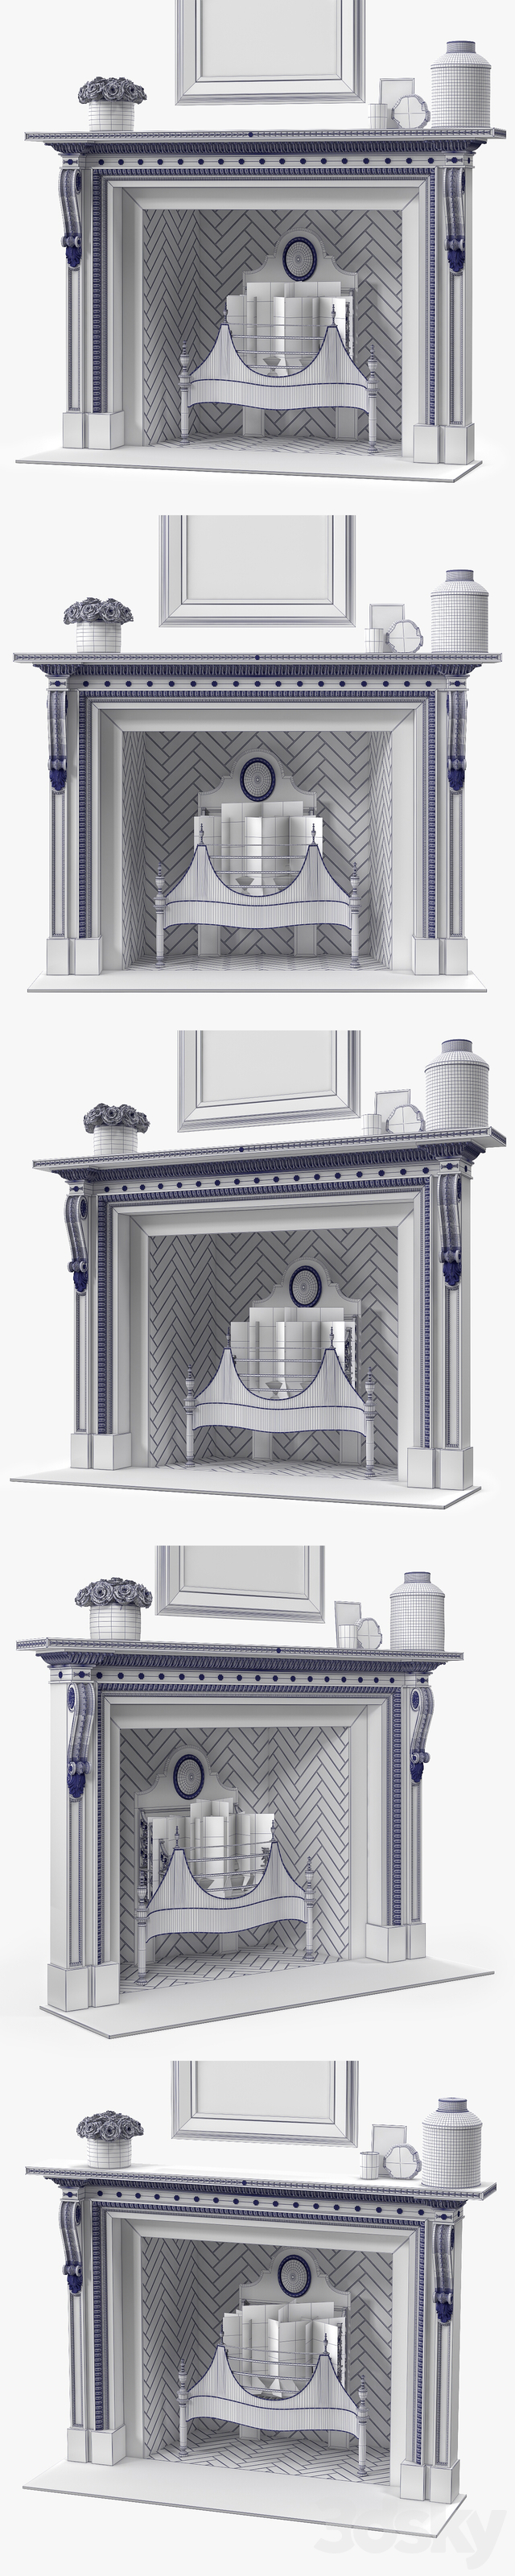 Chesneys The Locke Fireplace